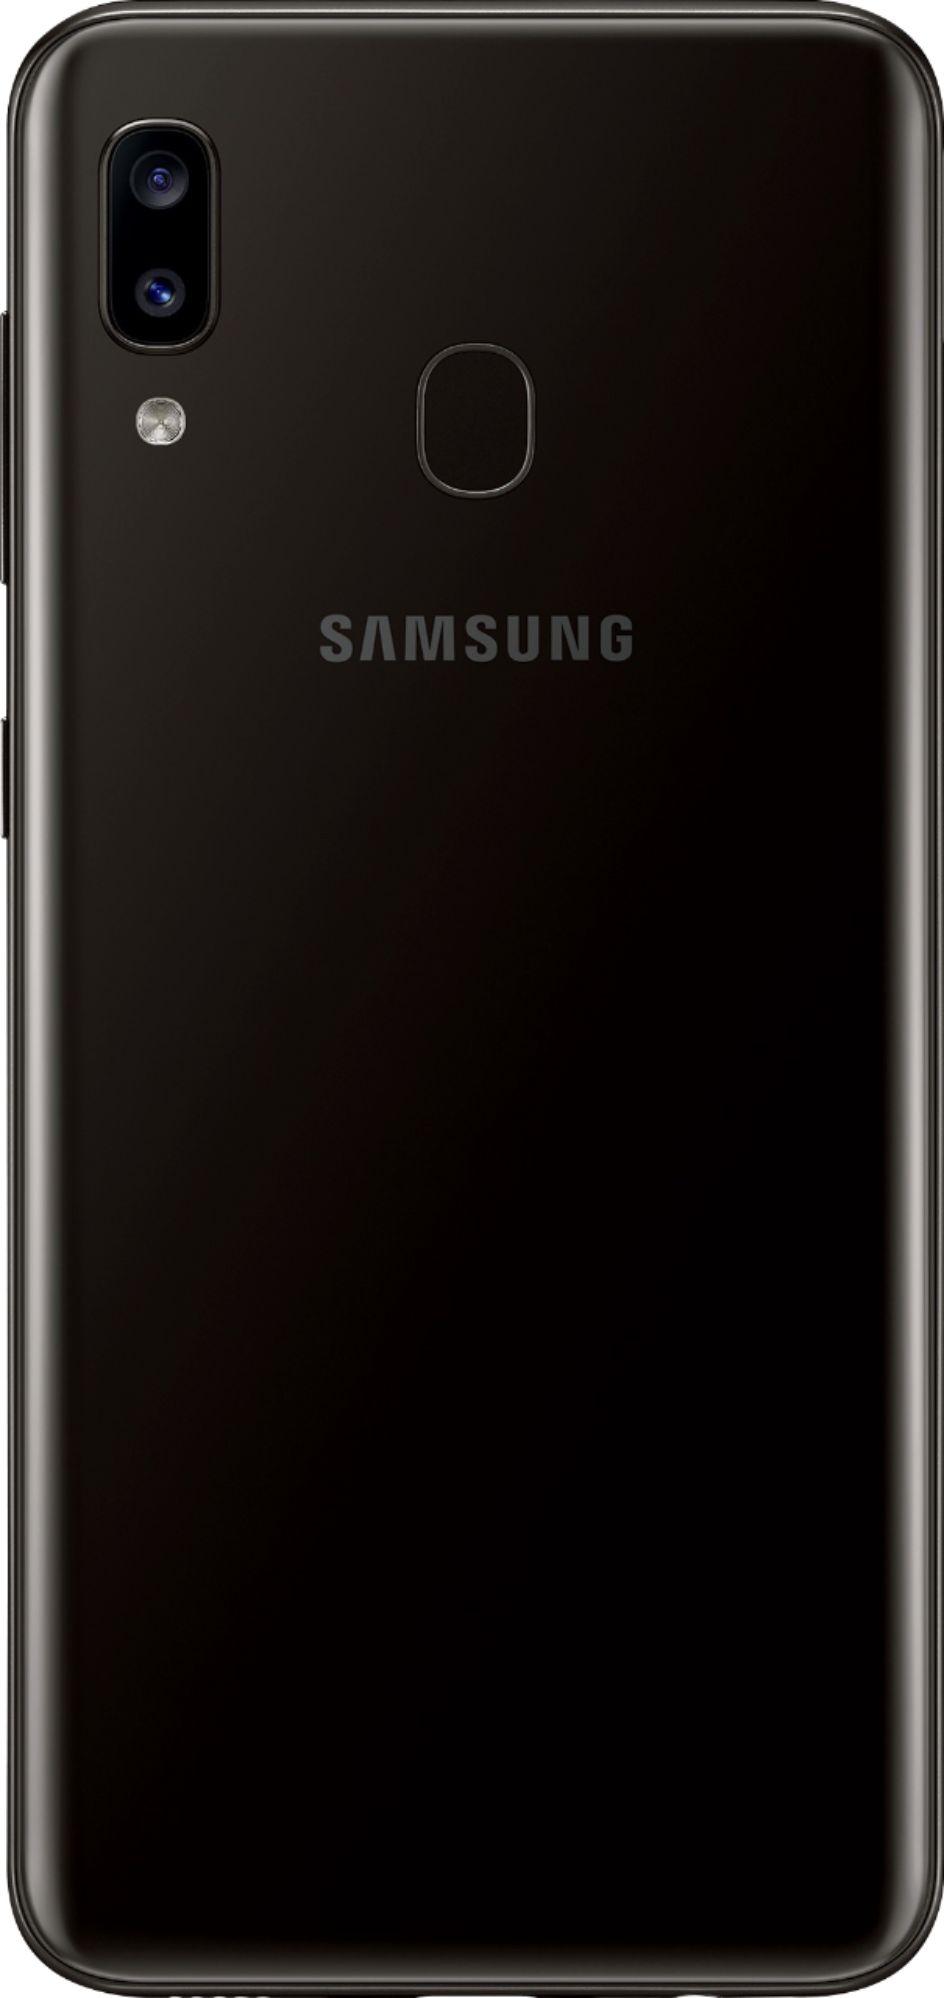 Samsung Galaxy A20 DS (SM-A205) 355710104206086 - 2